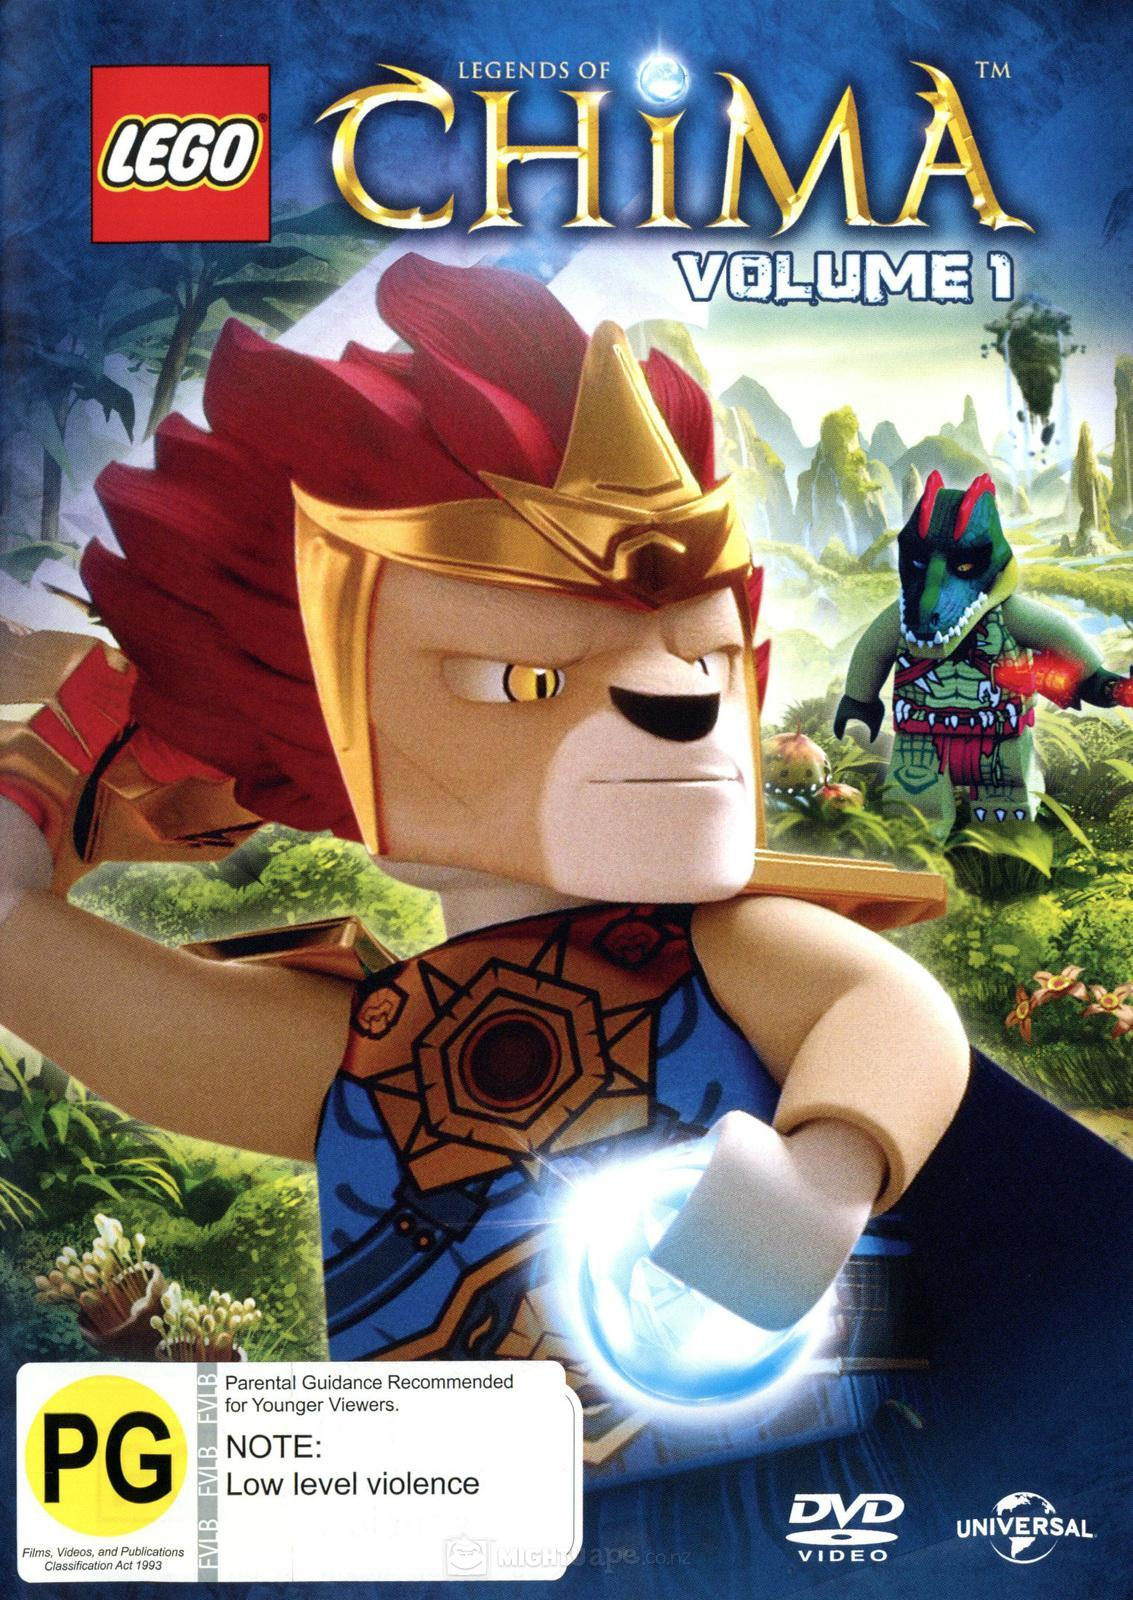 LEGO Legends Of Chima - Volume 1